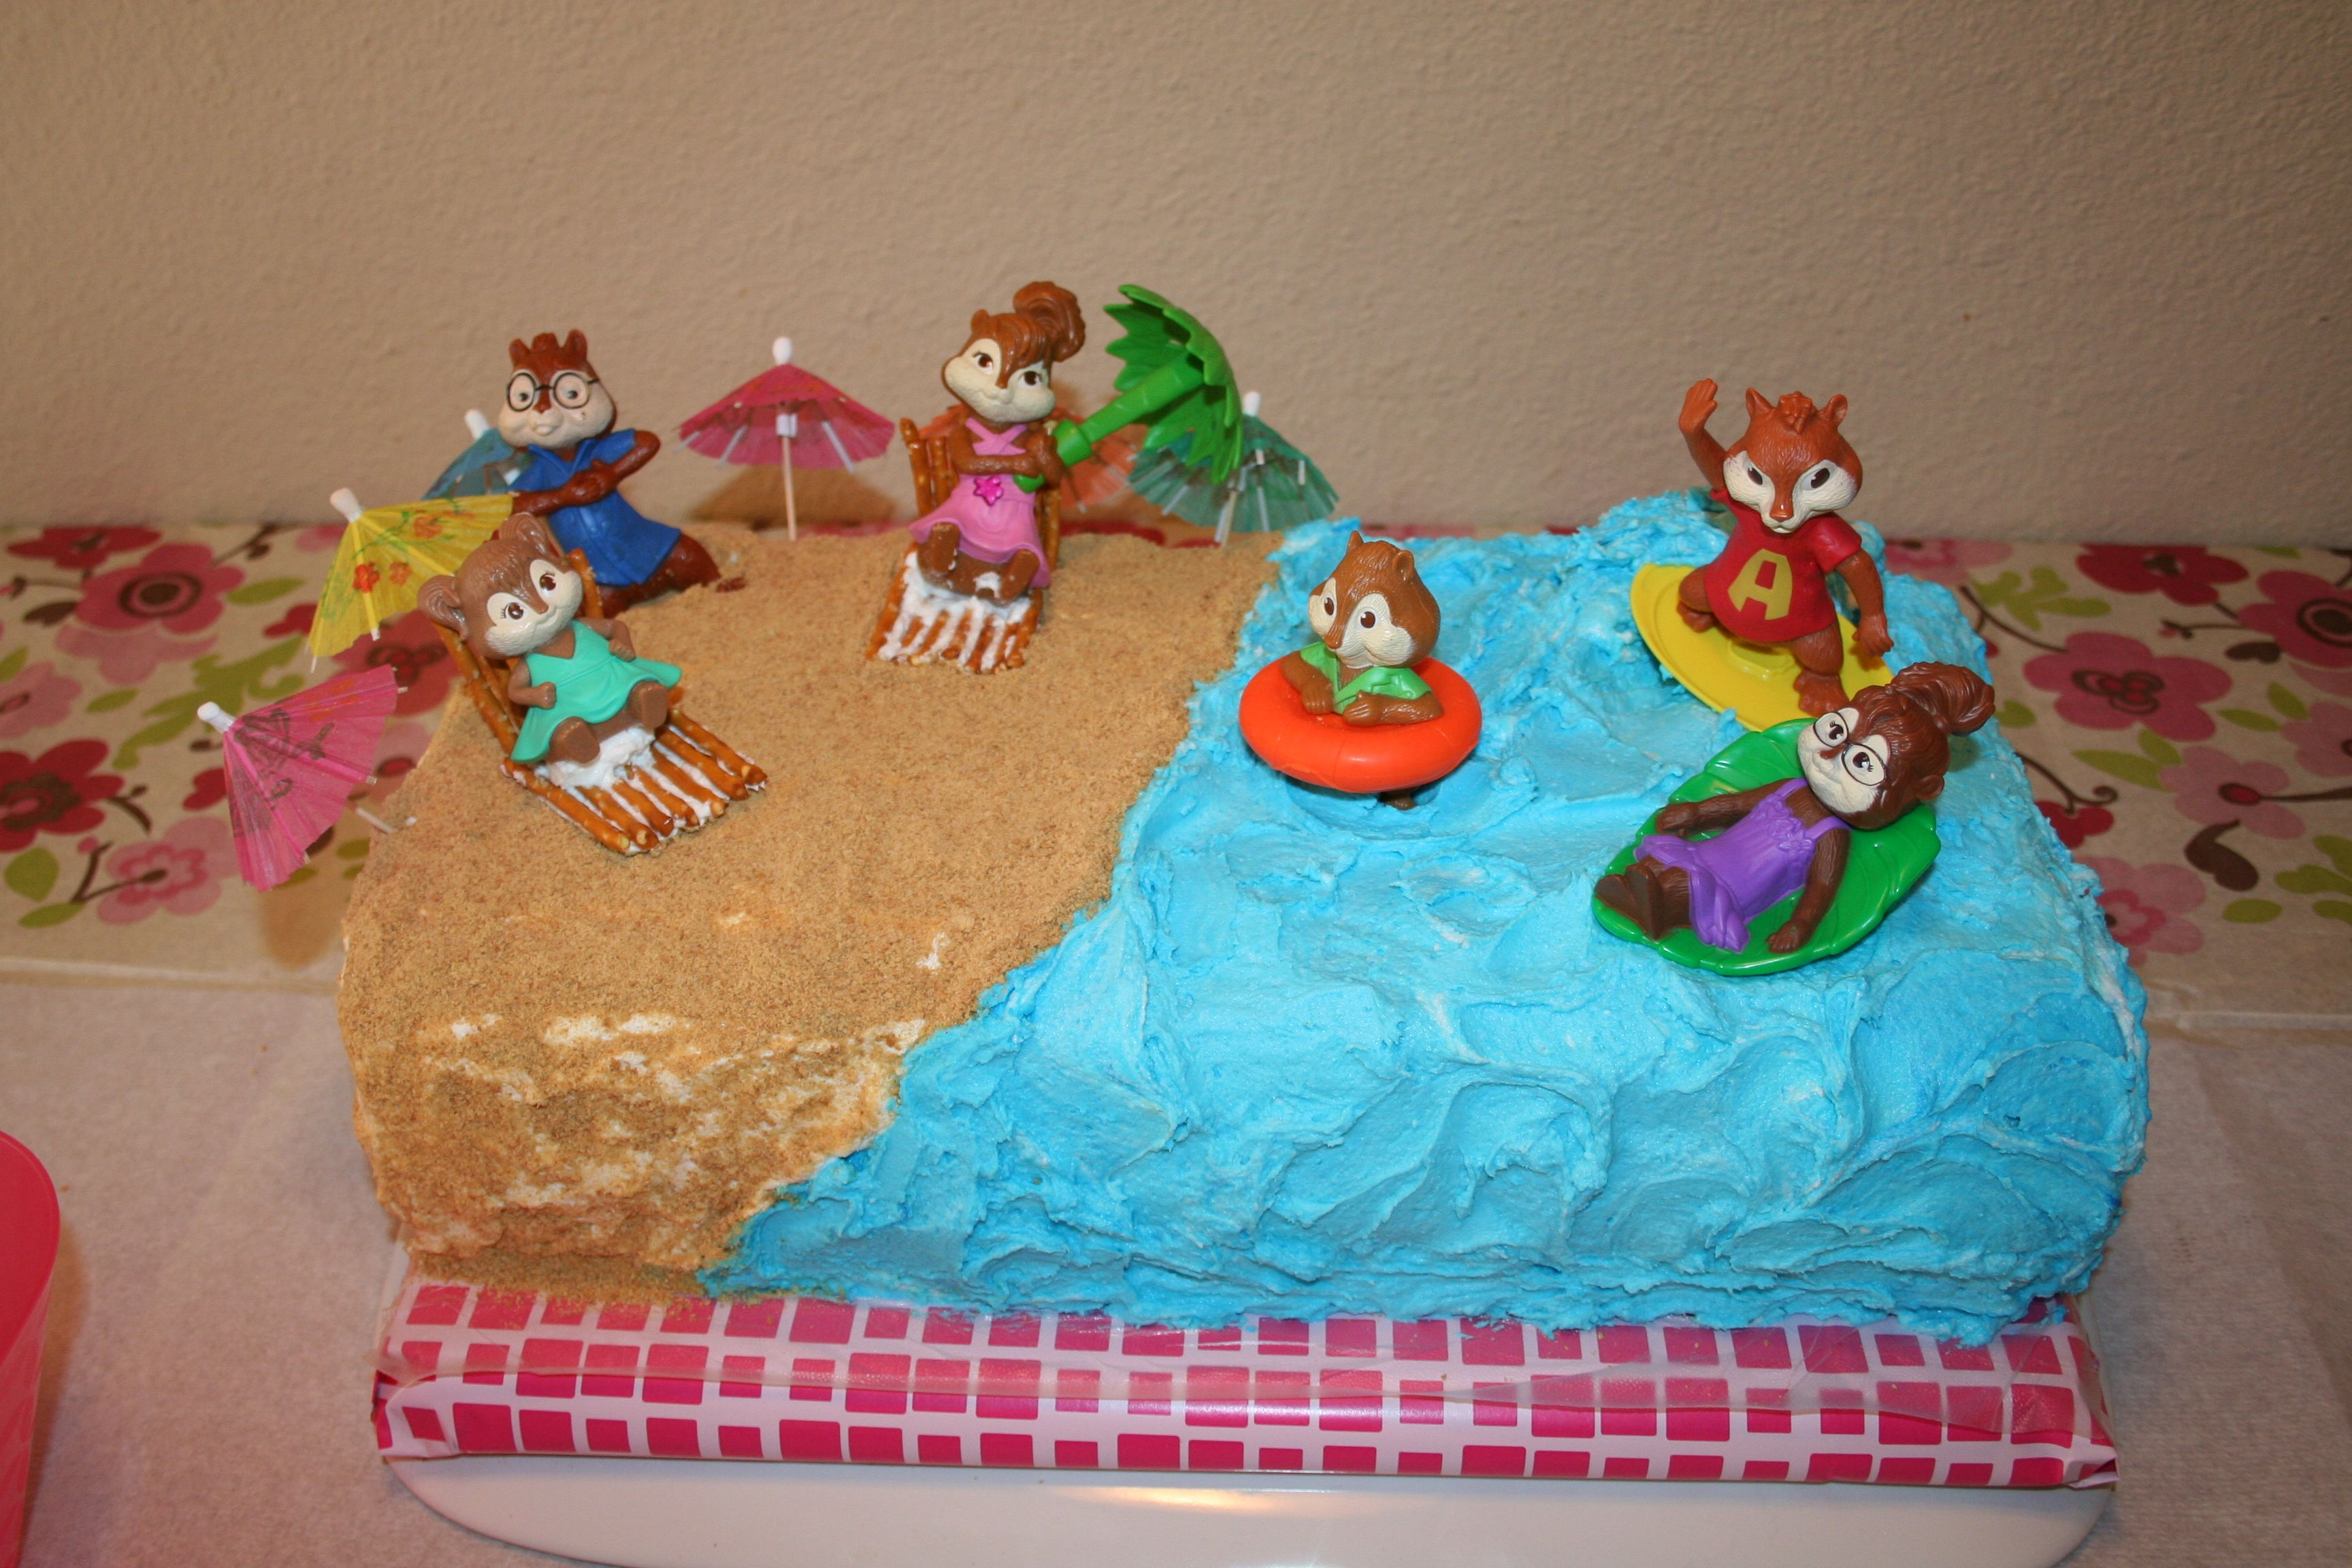 Alvin And The Chipmunks Birthday Cake: Alvin And The Chipmunks/Chipettes Cake